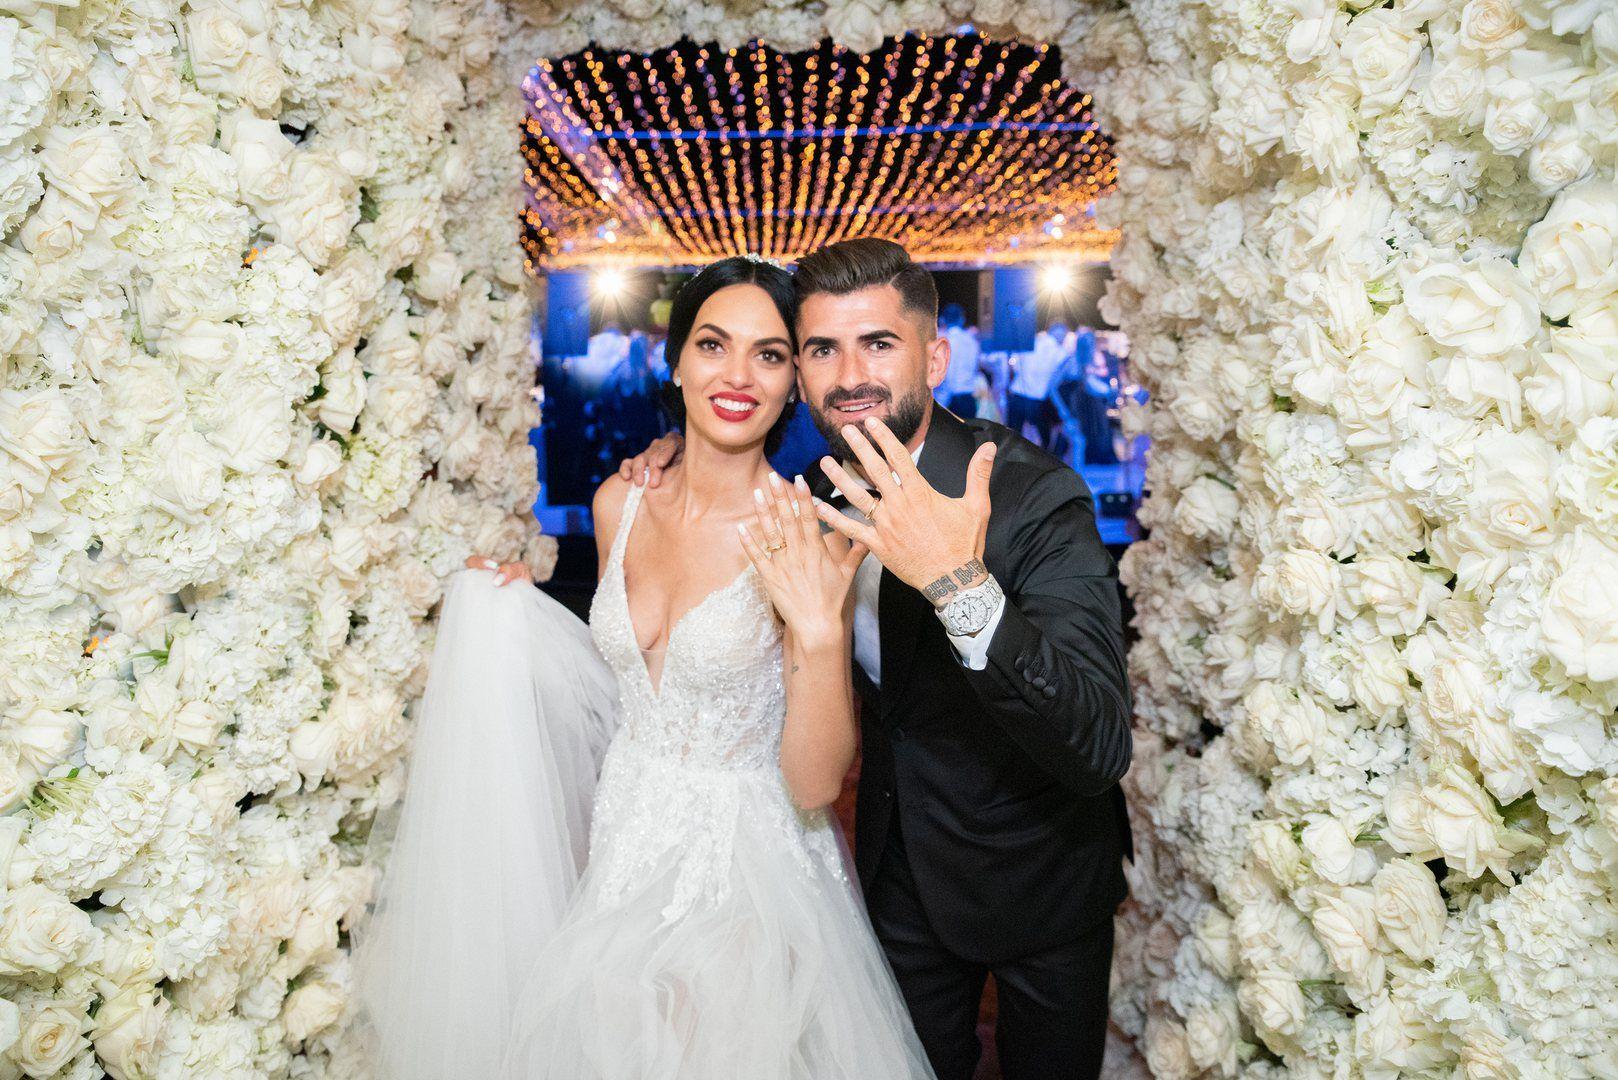 Fiorenza Lekstakaj & Elseid Hysaj | Wedding dresses lace, Wedding dresses, Bride